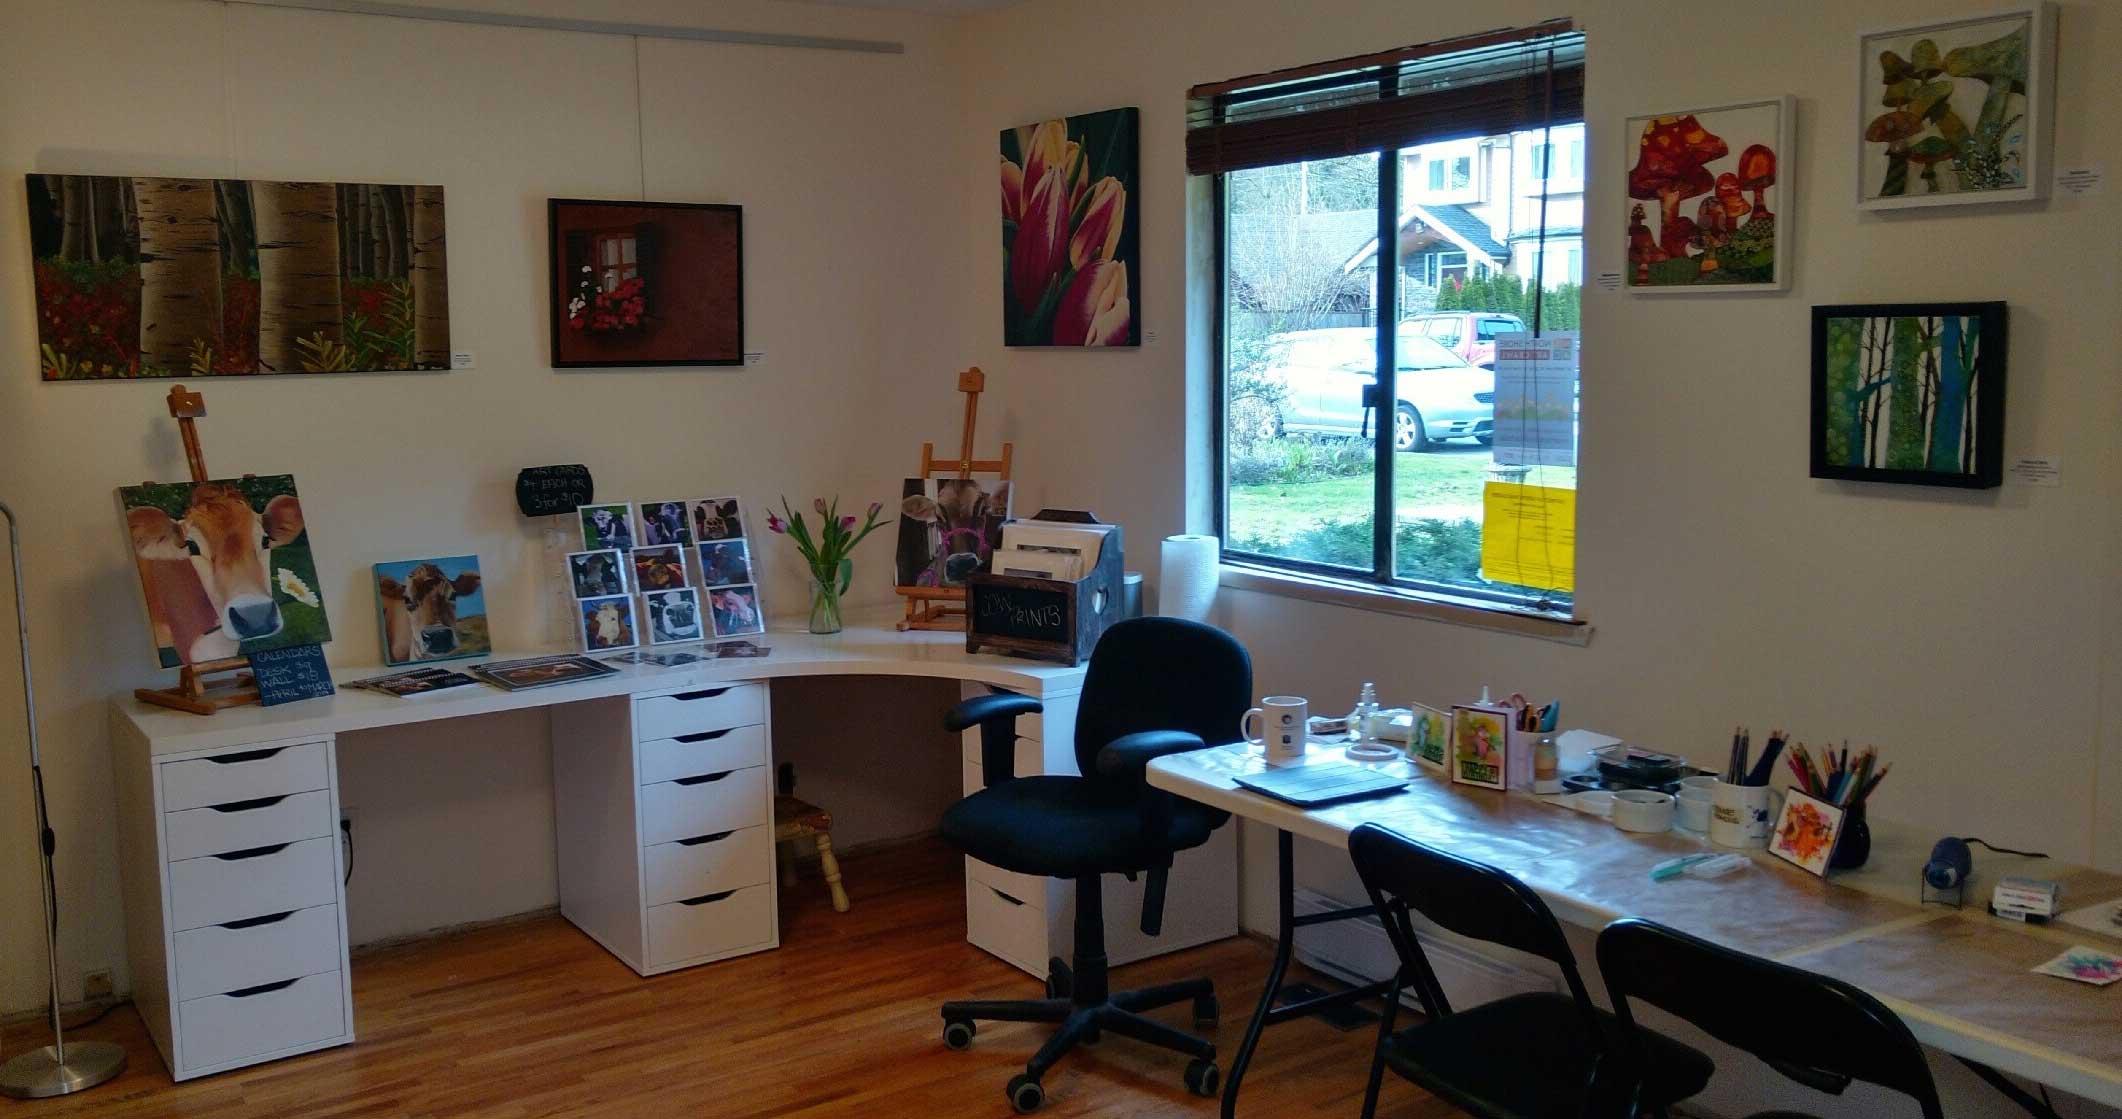 North Vancouver Studio Art Gallery